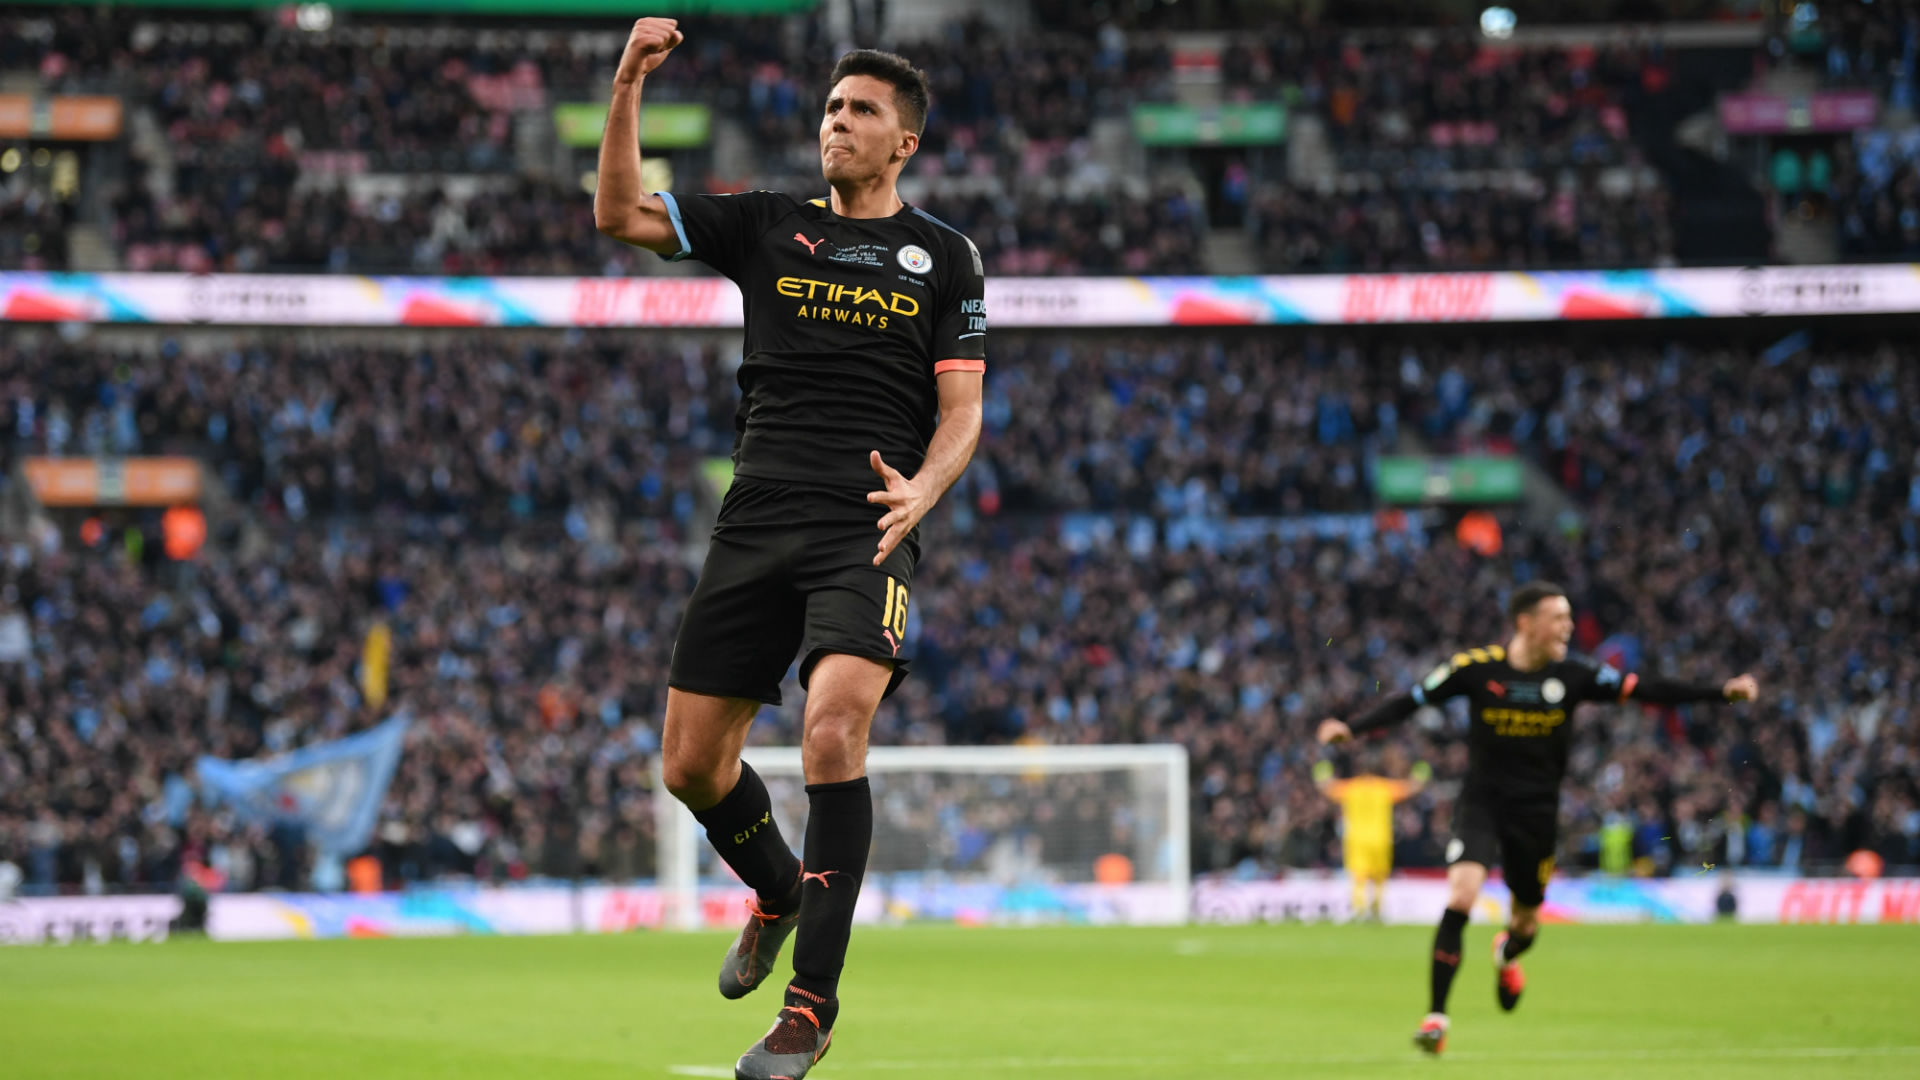 Aston Villa 1-2 Manchester City: Fifth EFL Cup triumph in seven seasons for City